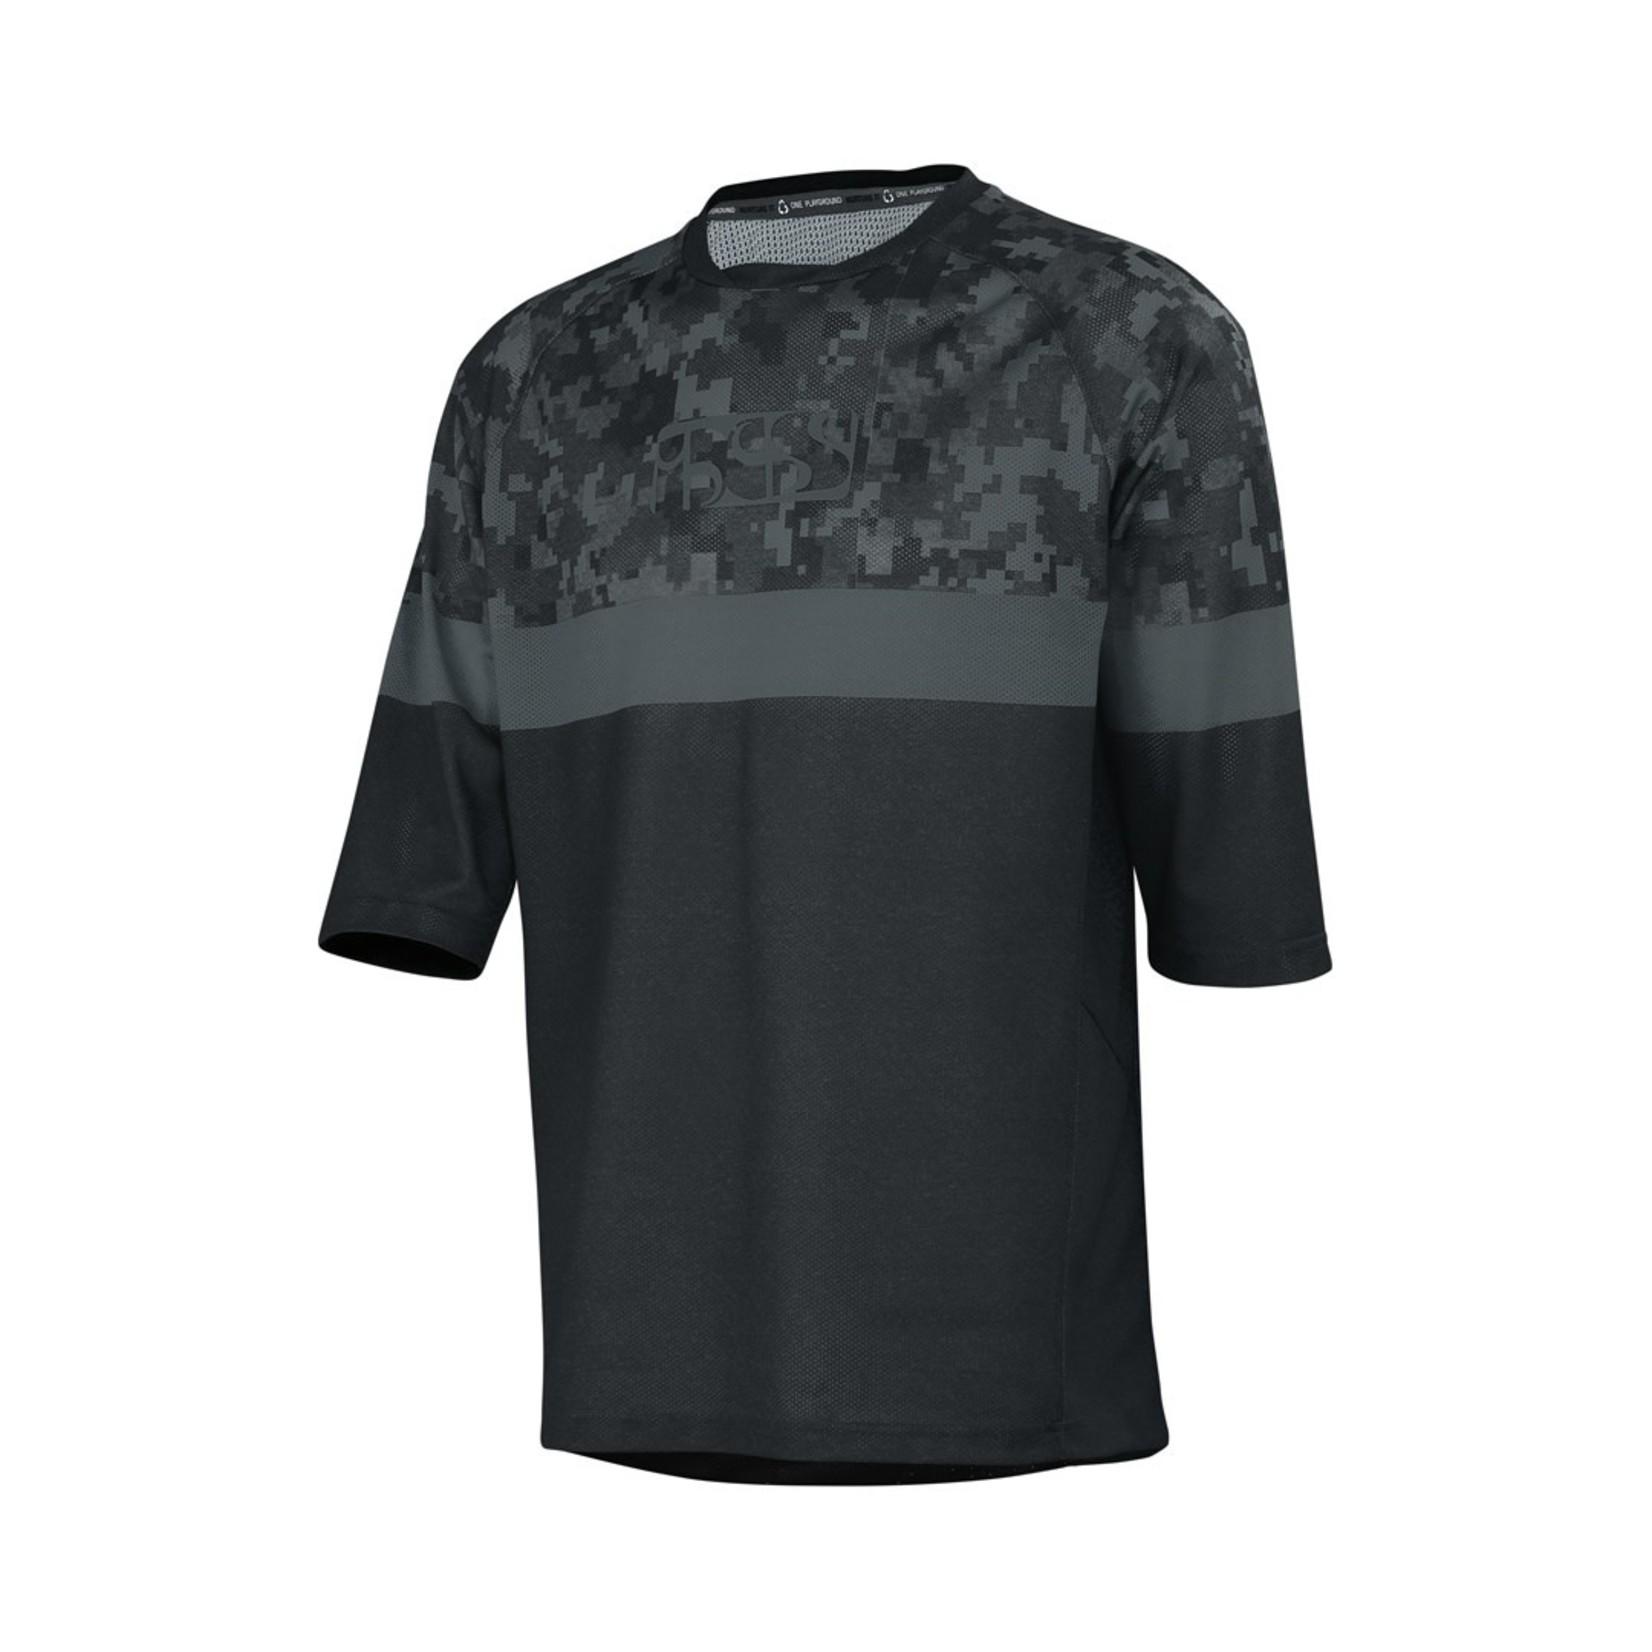 IXS IXS T-Shirt Carve Air Jersey Black Camo (S)